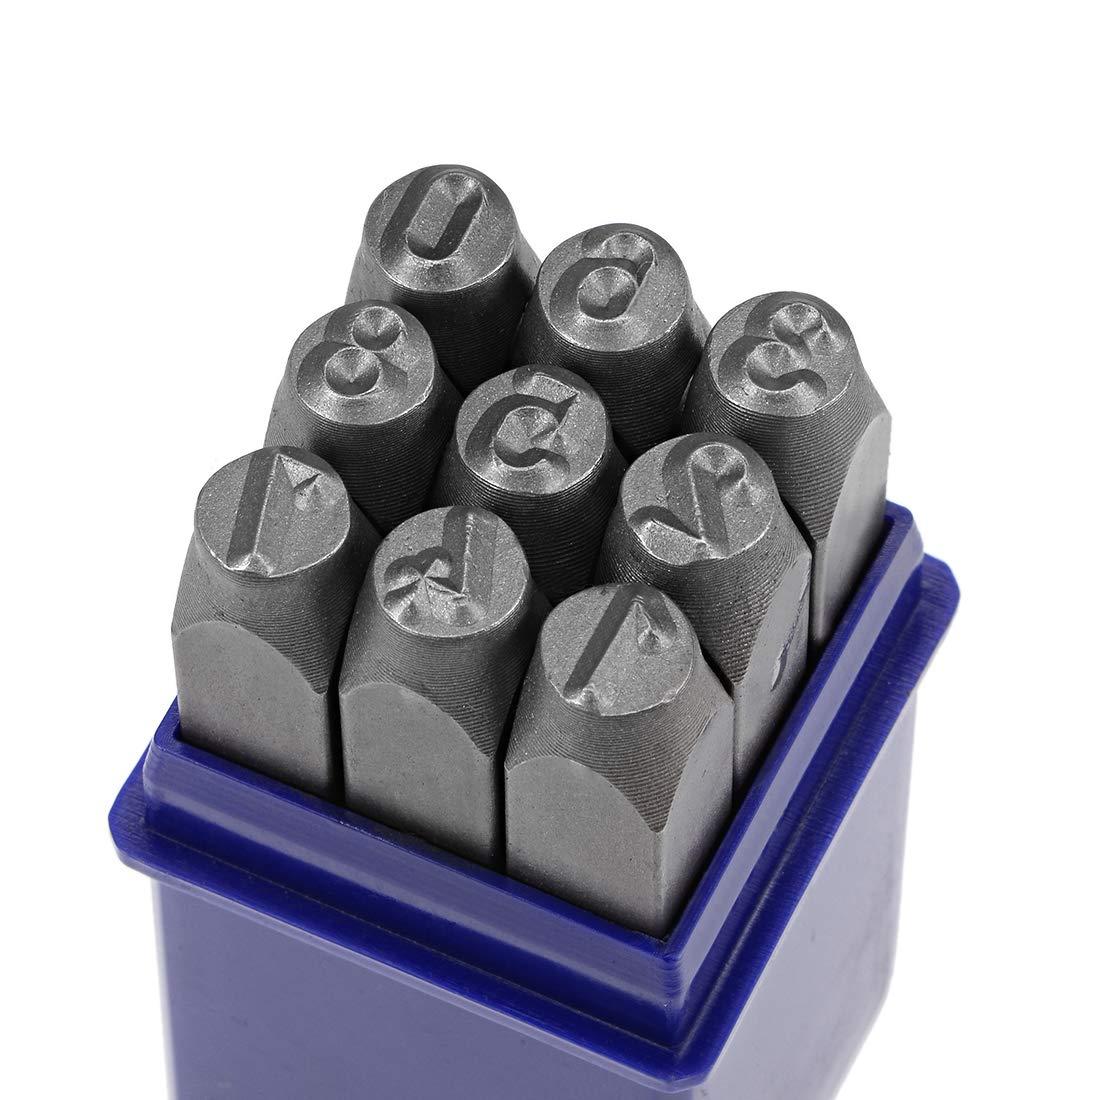 "Digital 0 to 9 5//32/"" 4mm Number Metal Stamp Set Steel Numbers Punch Sets"